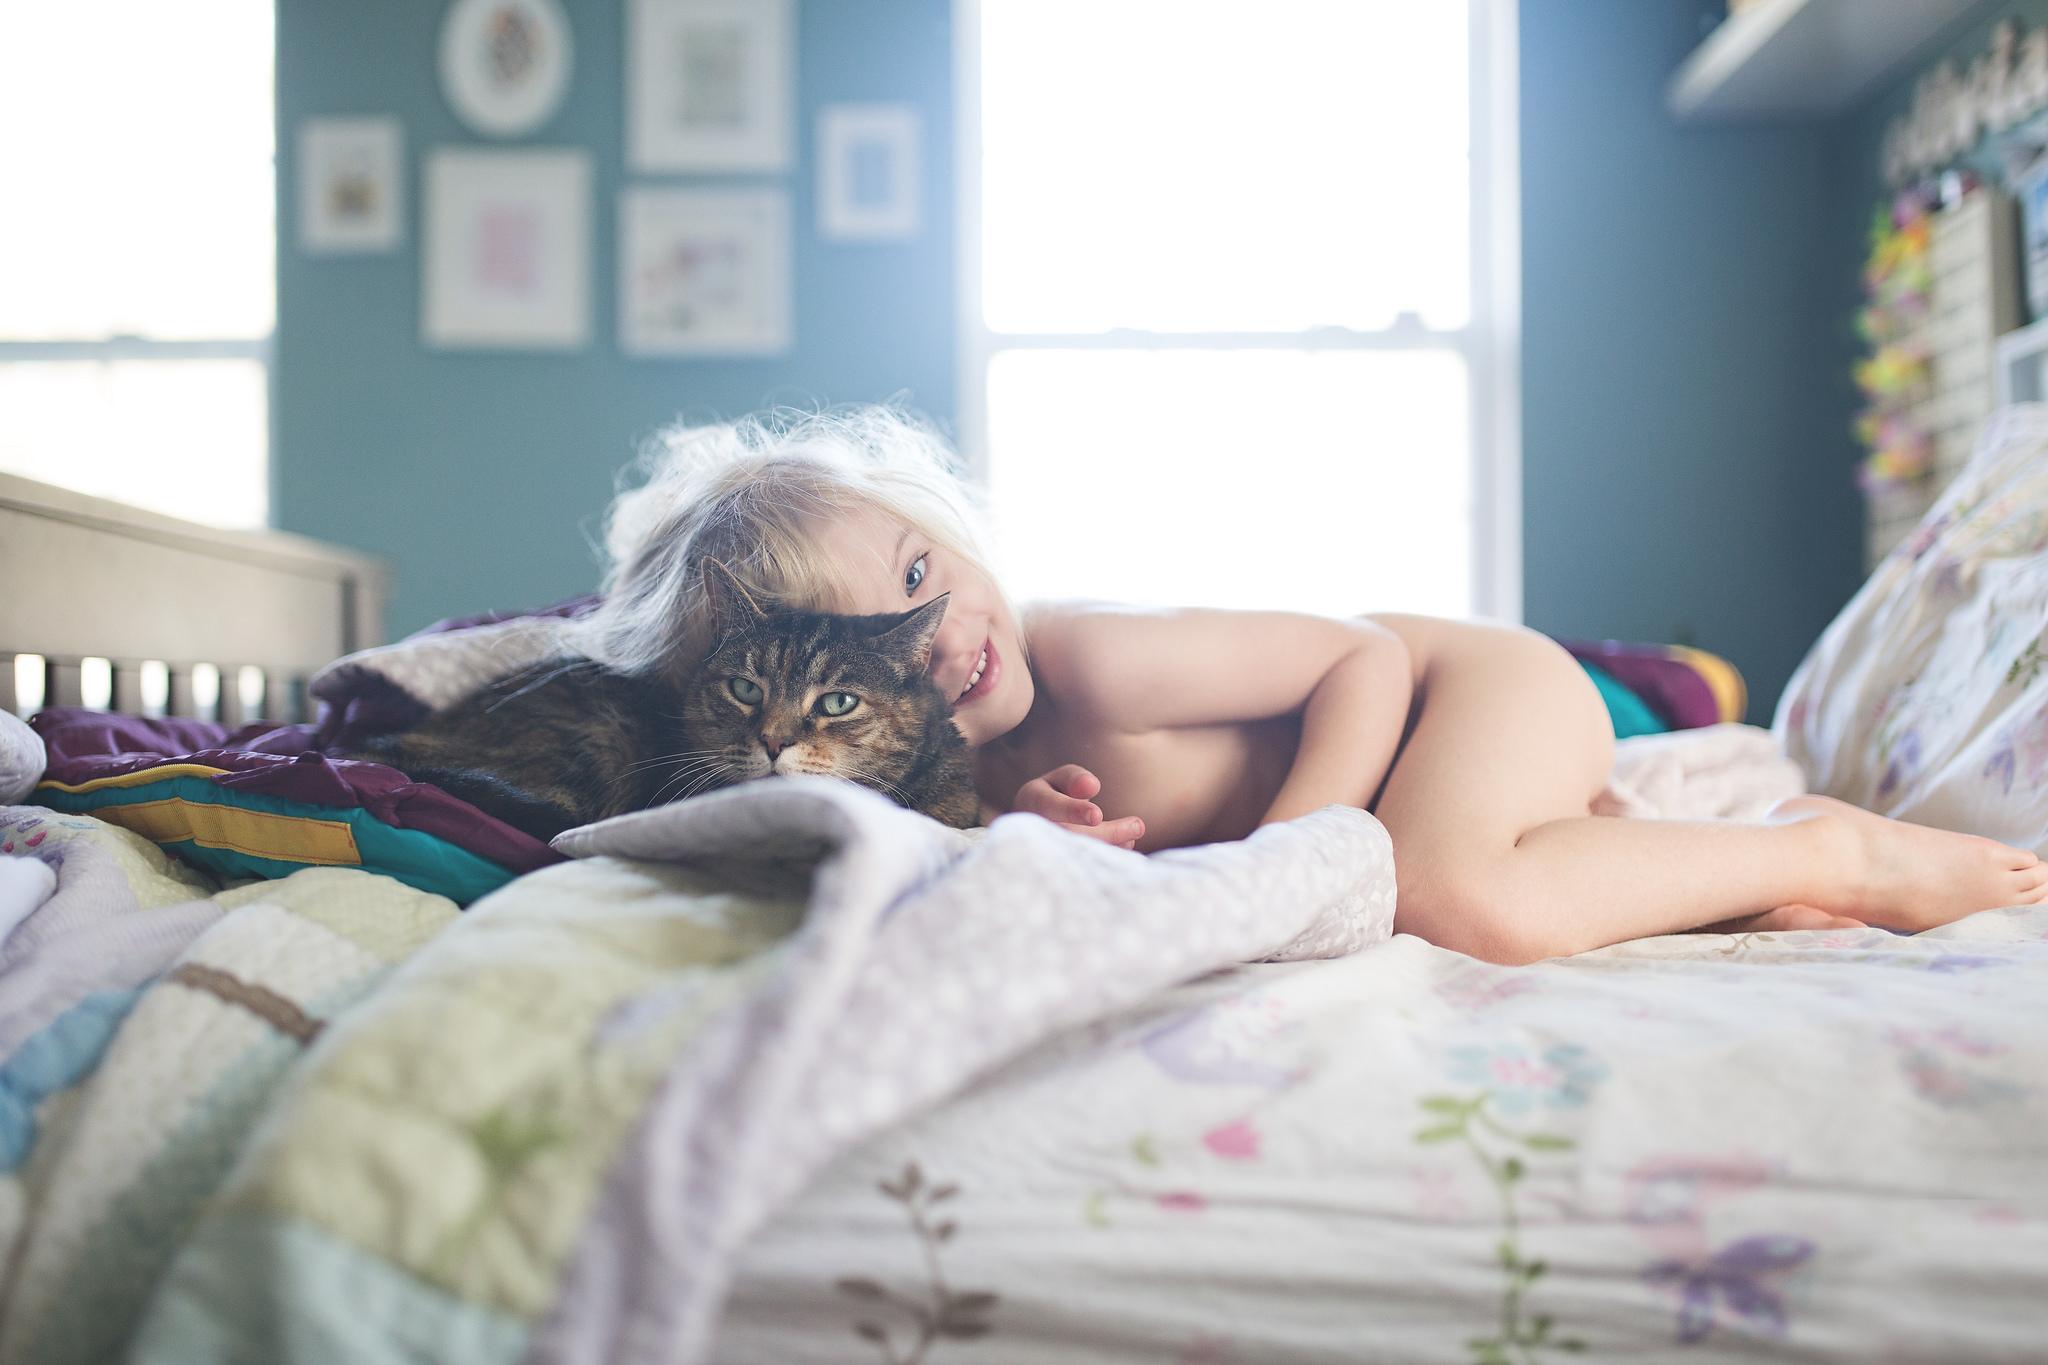 hello-olivia-photography-family-photojournalism-365-tutorial-documenting-bedtime-rituals-lowlight-kids-documentary-and lifestyle-photographer-long-island-new-york2.jpg